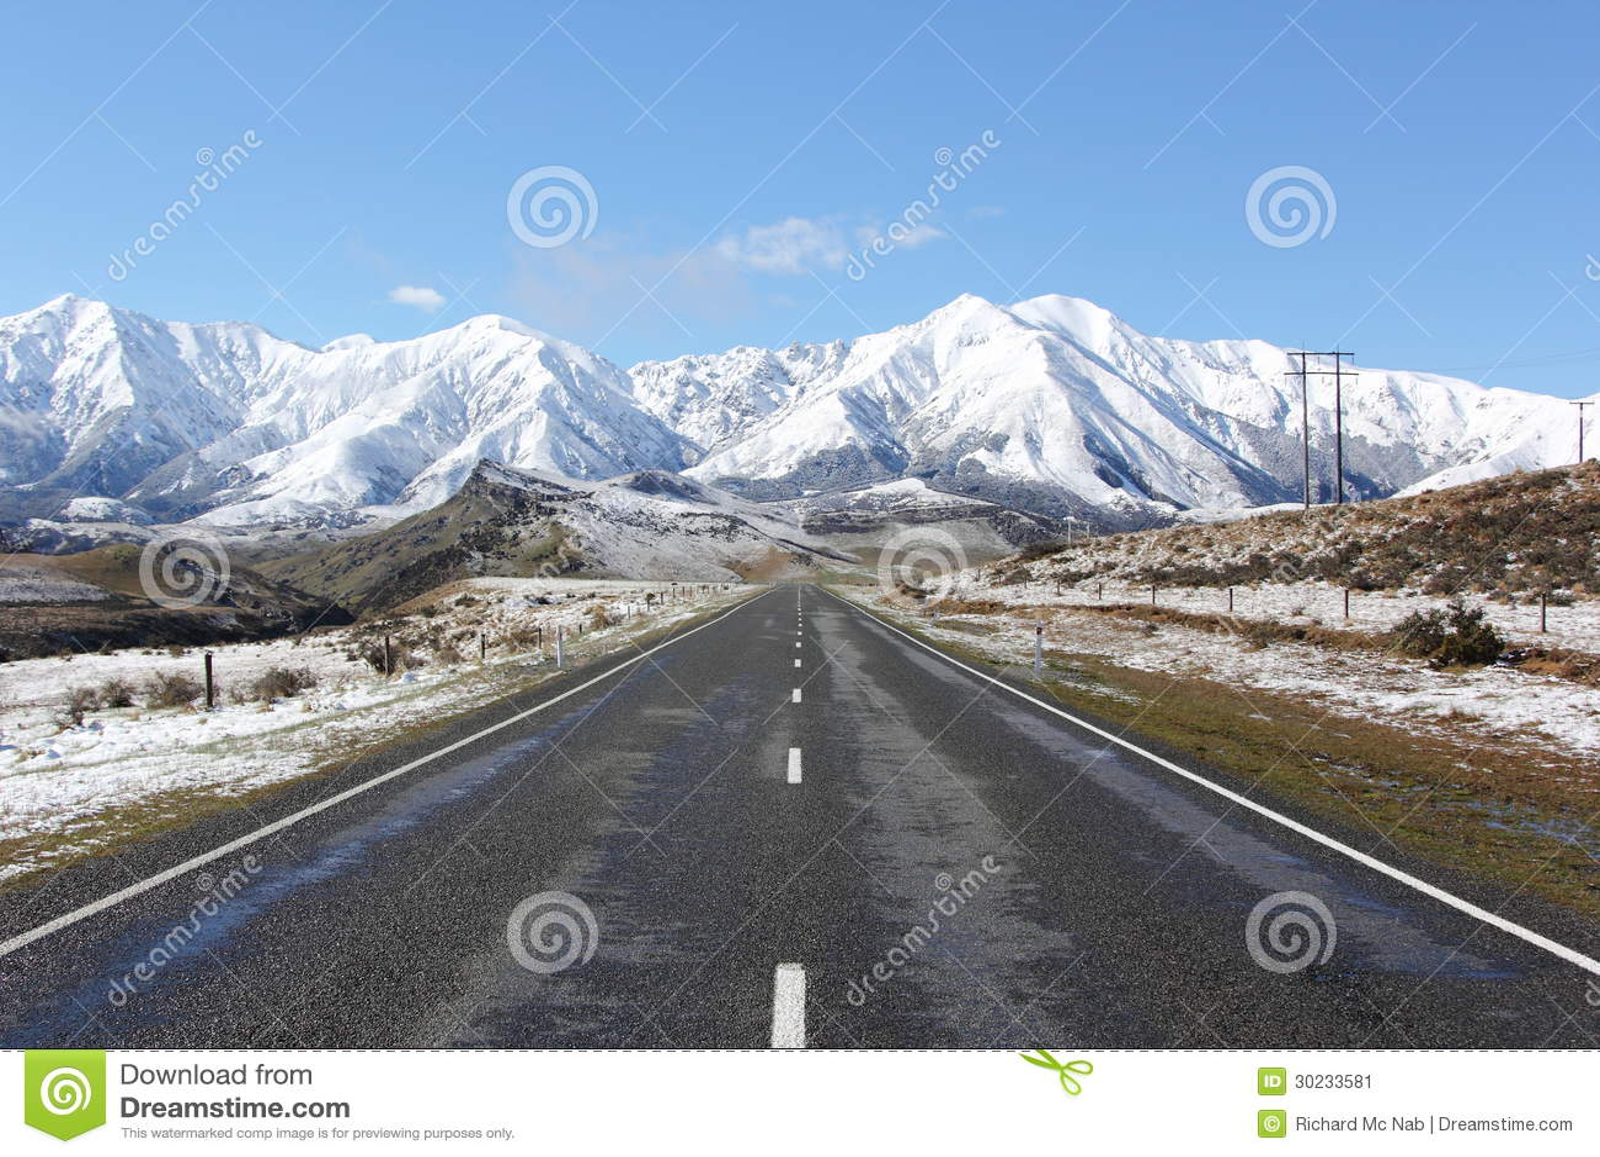 towards the snowy - photo #29